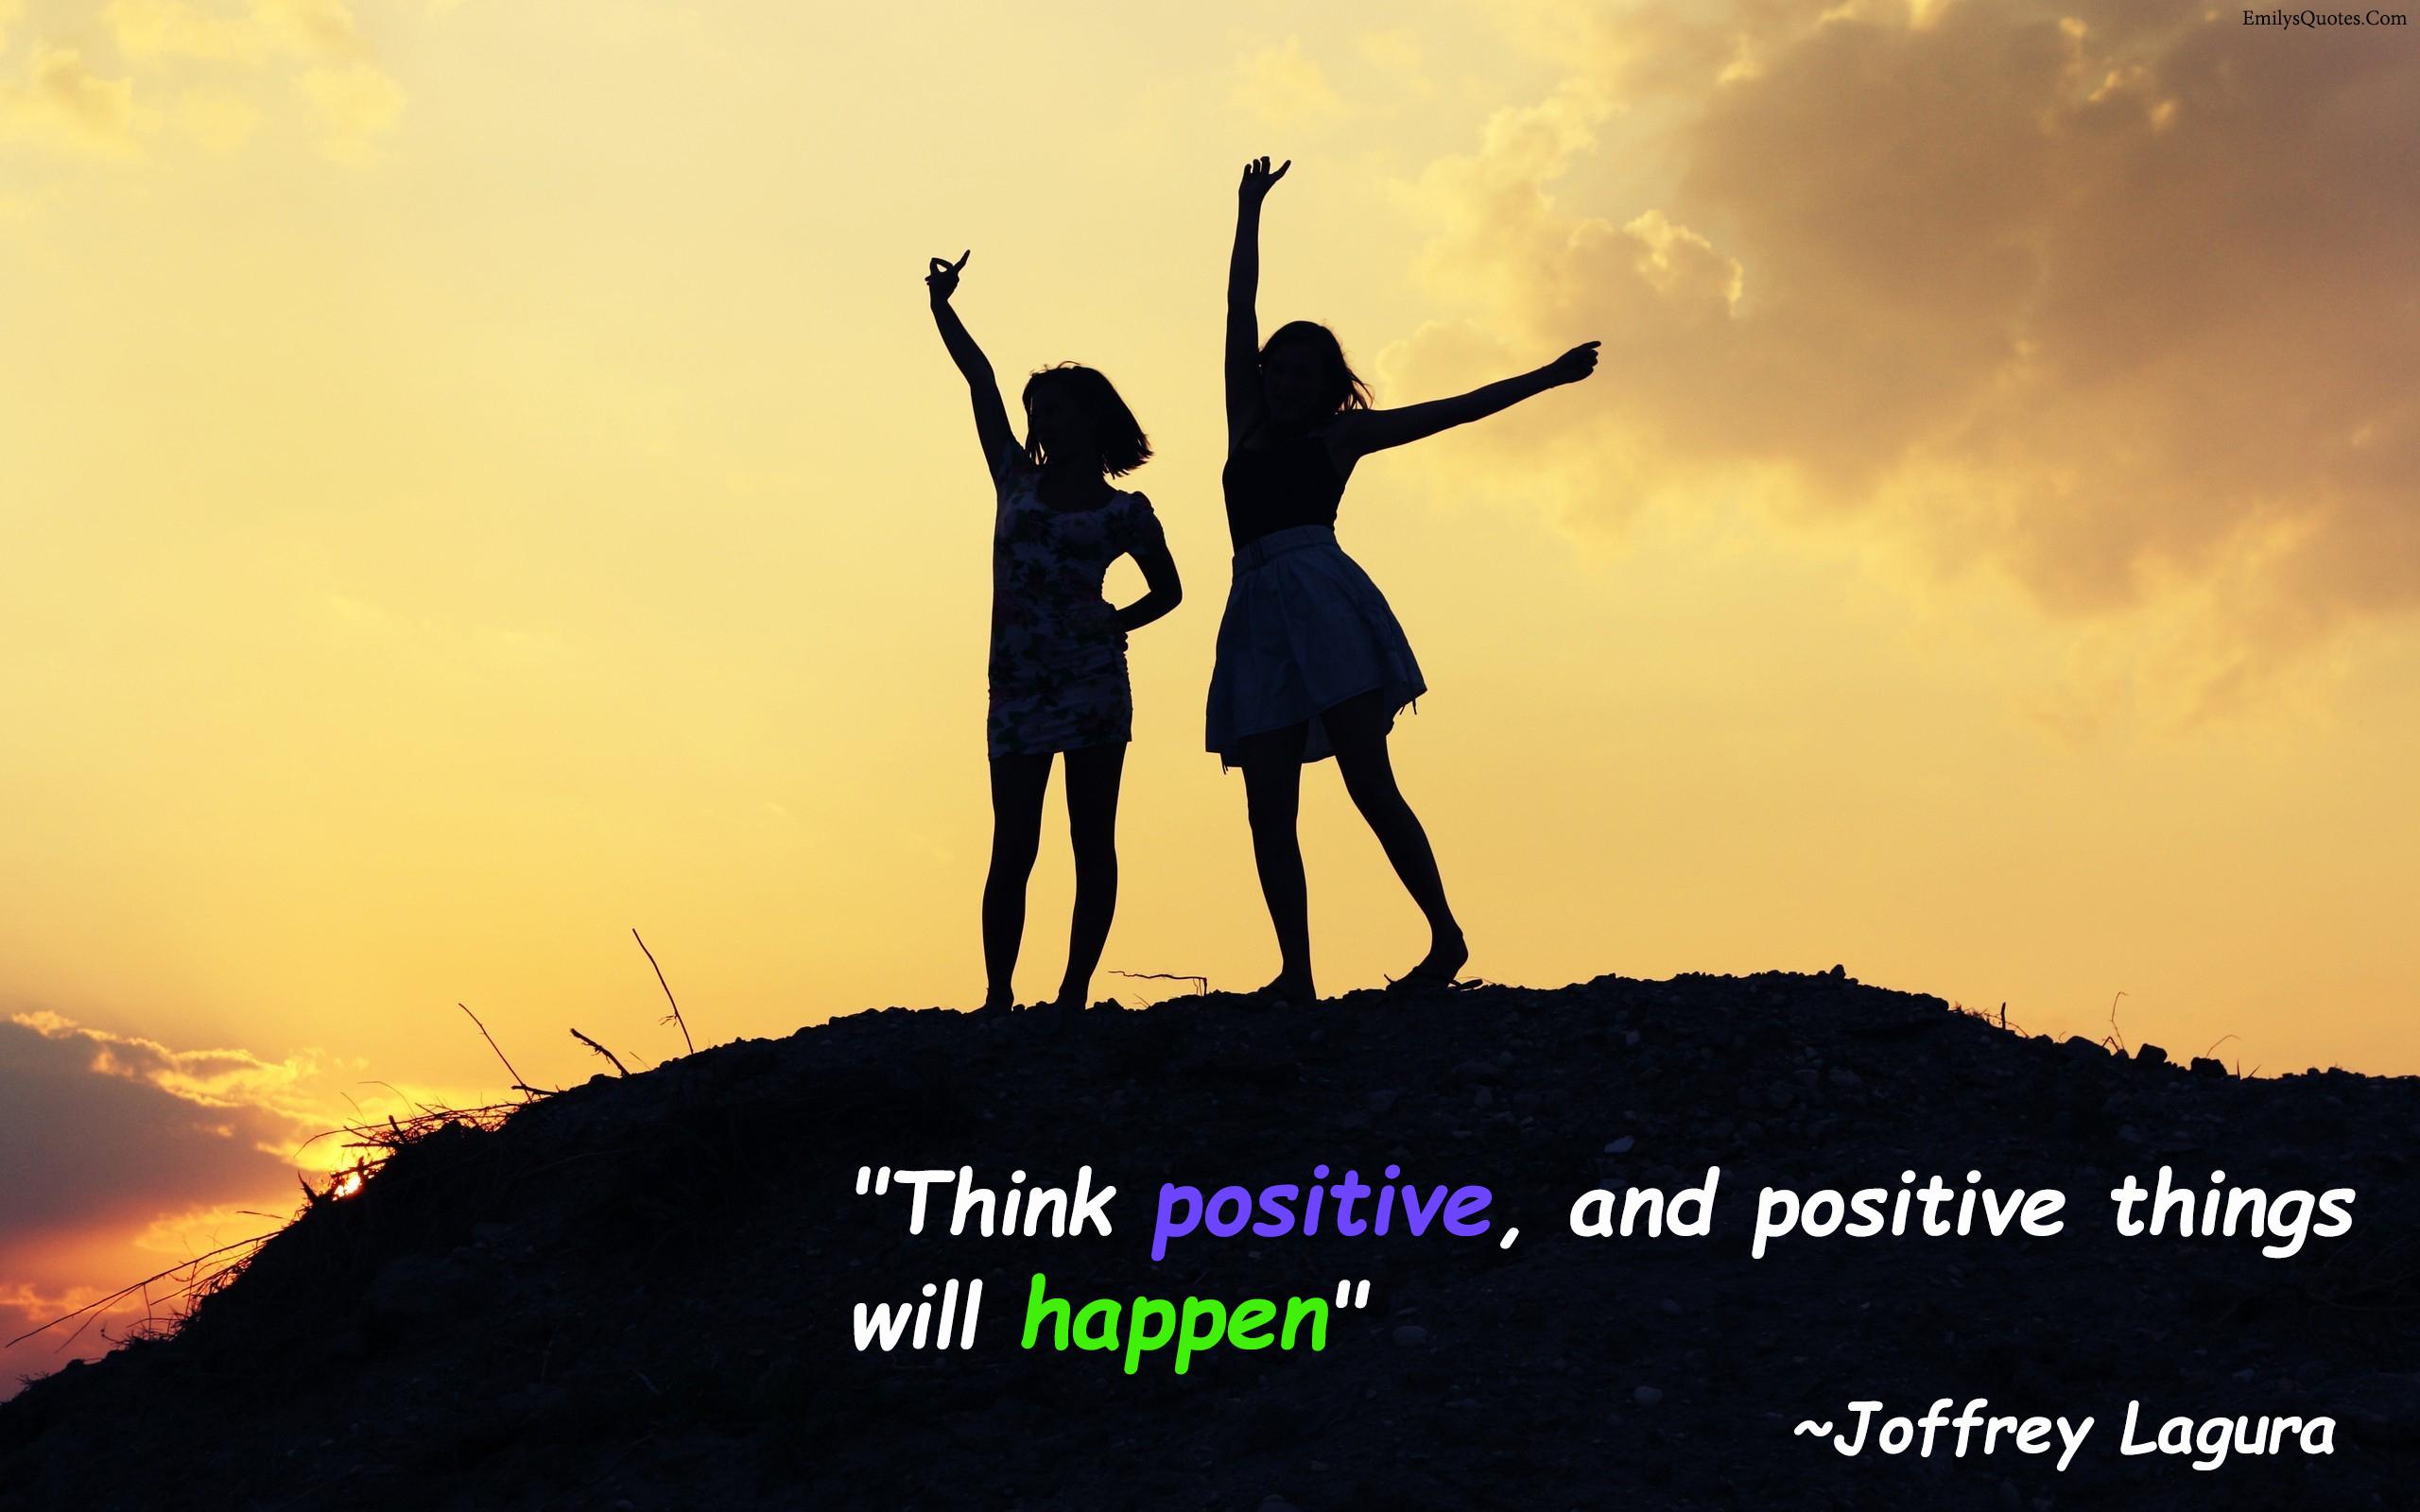 EmilysQuotes.Com - positive, life, inspirational,  Joffrey Lagura